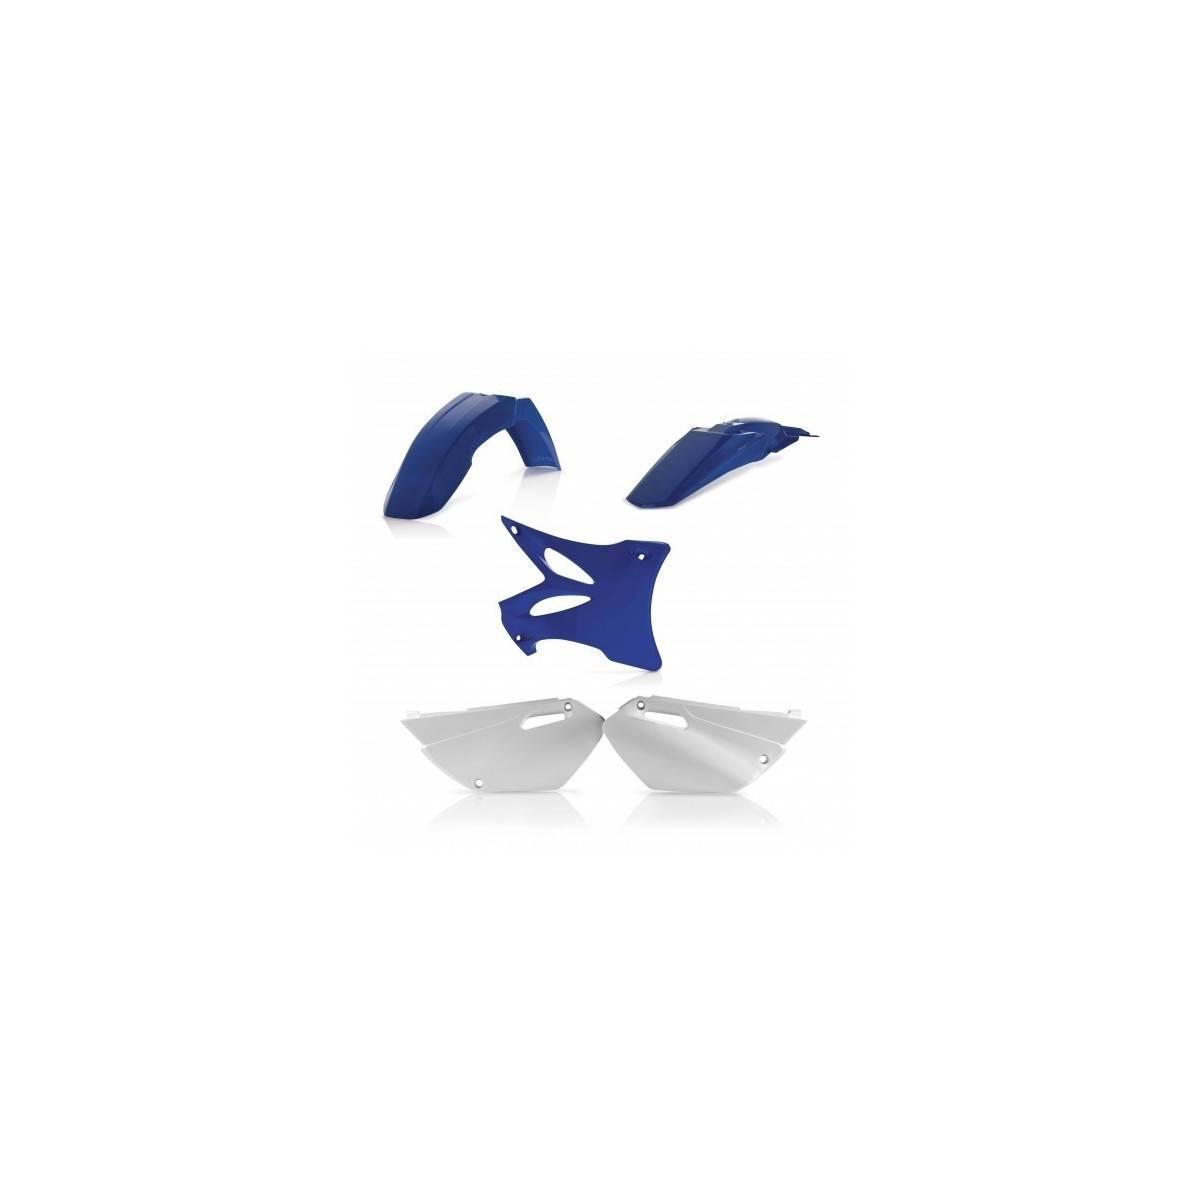 0011513-553 - Kit Plasticos Wrf 250 07 13 Wrf 450 07 11 Origen